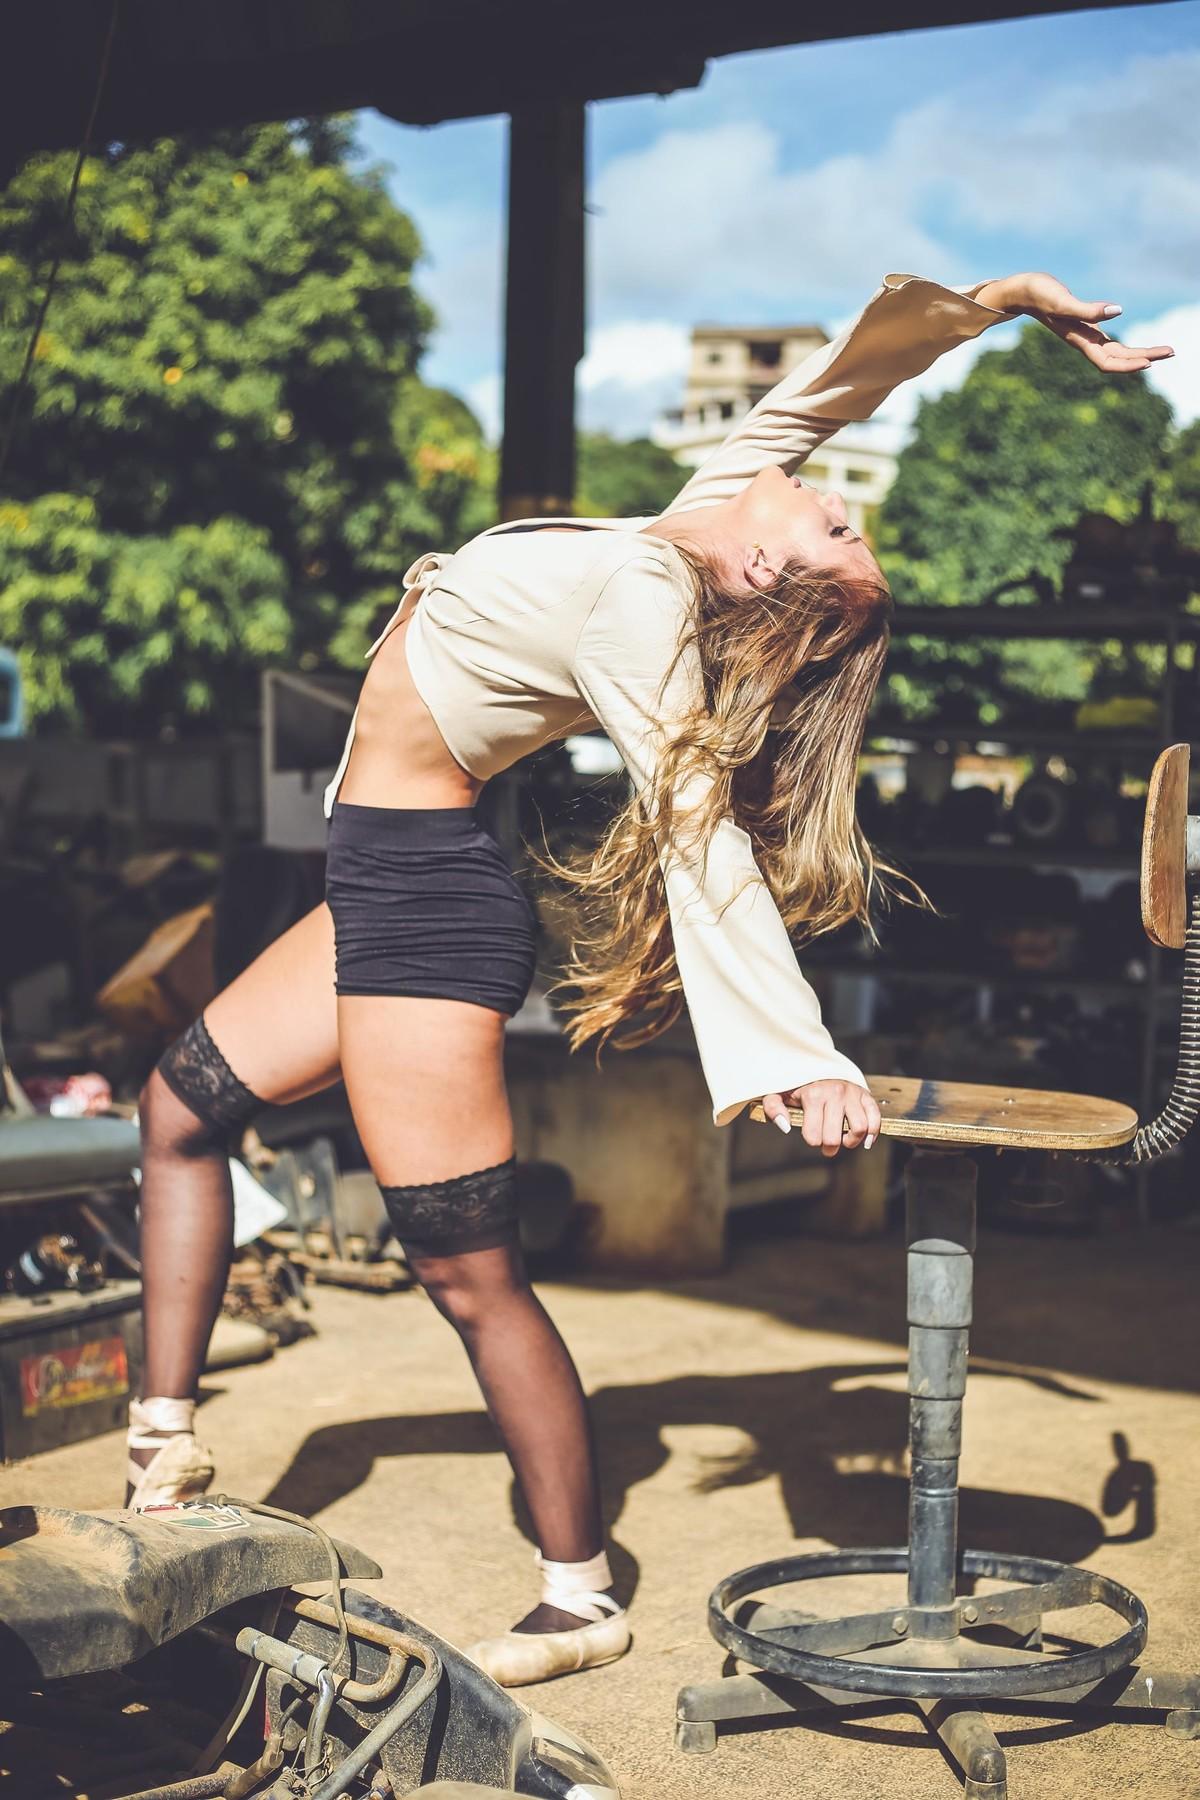 Moda vitoria editoral fashion capixaba fotos ensaio cute feminina beauty girls make-up hair ensaio feminino fotos body cabelo boho inspiração praia praiana book capixaba